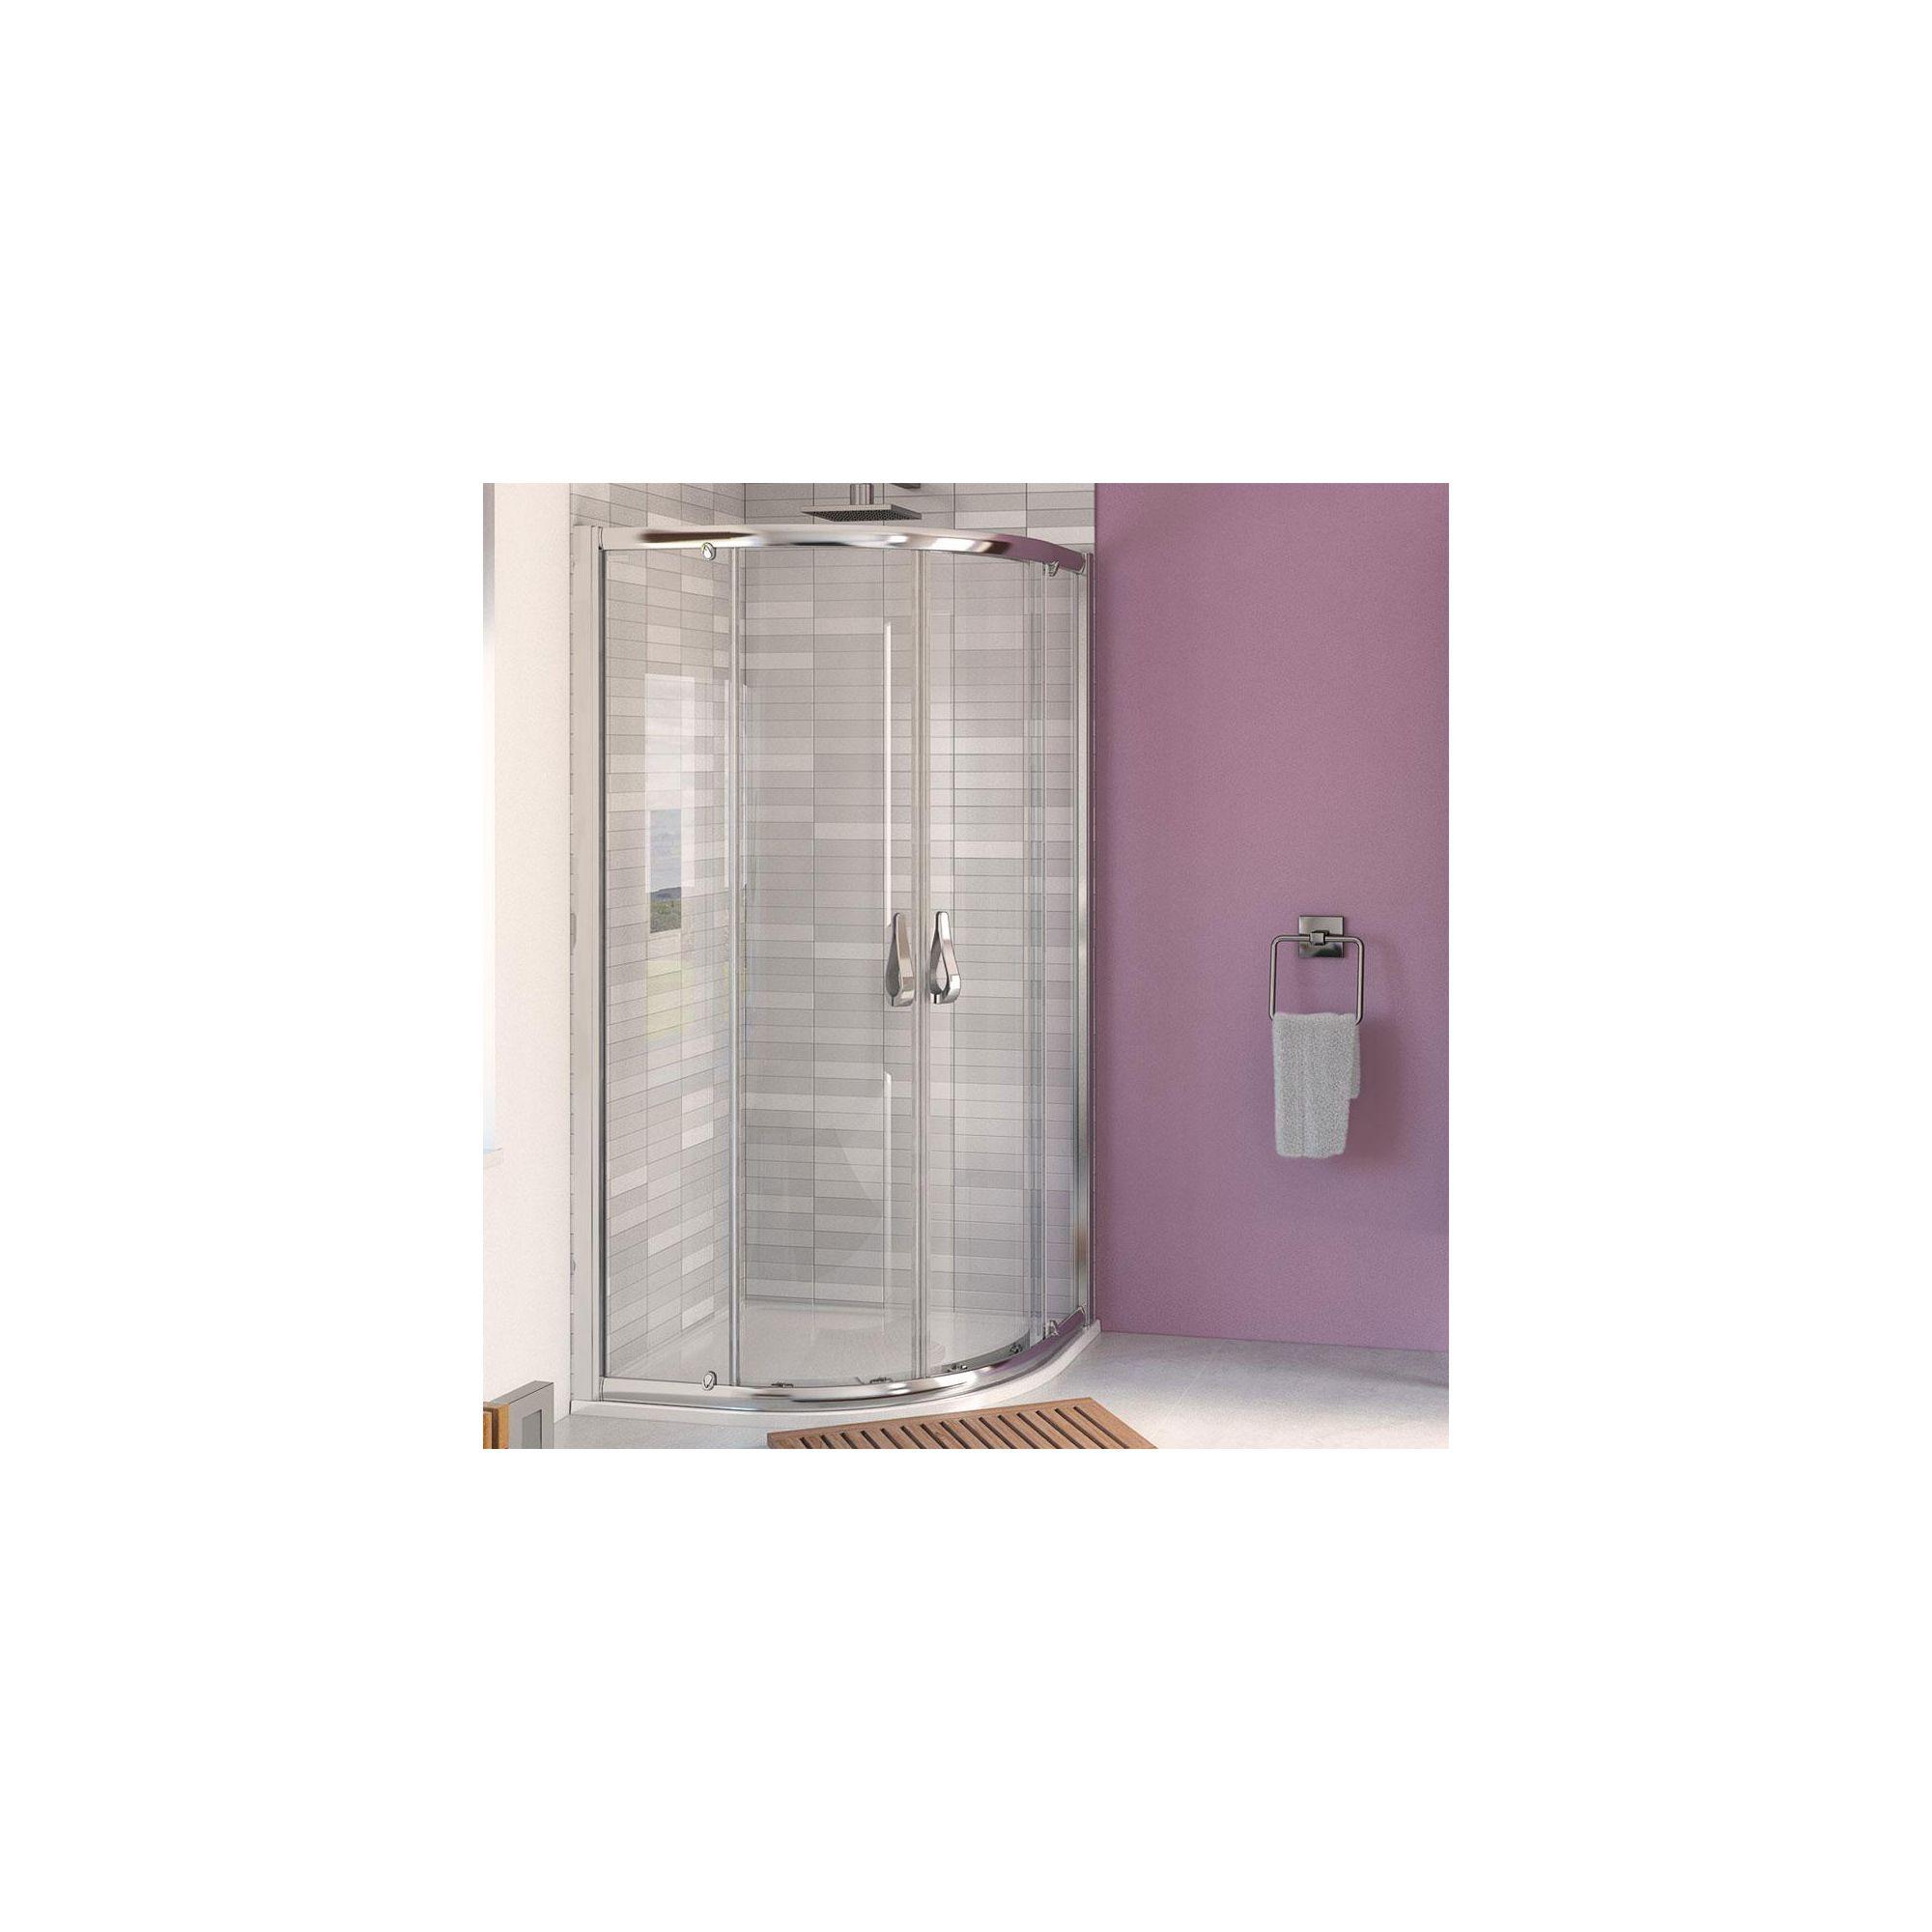 Aqualux AQUA6 Quadrant Shower Door, 760mm x 760mm, Polished Silver Frame, 6mm Glass at Tesco Direct